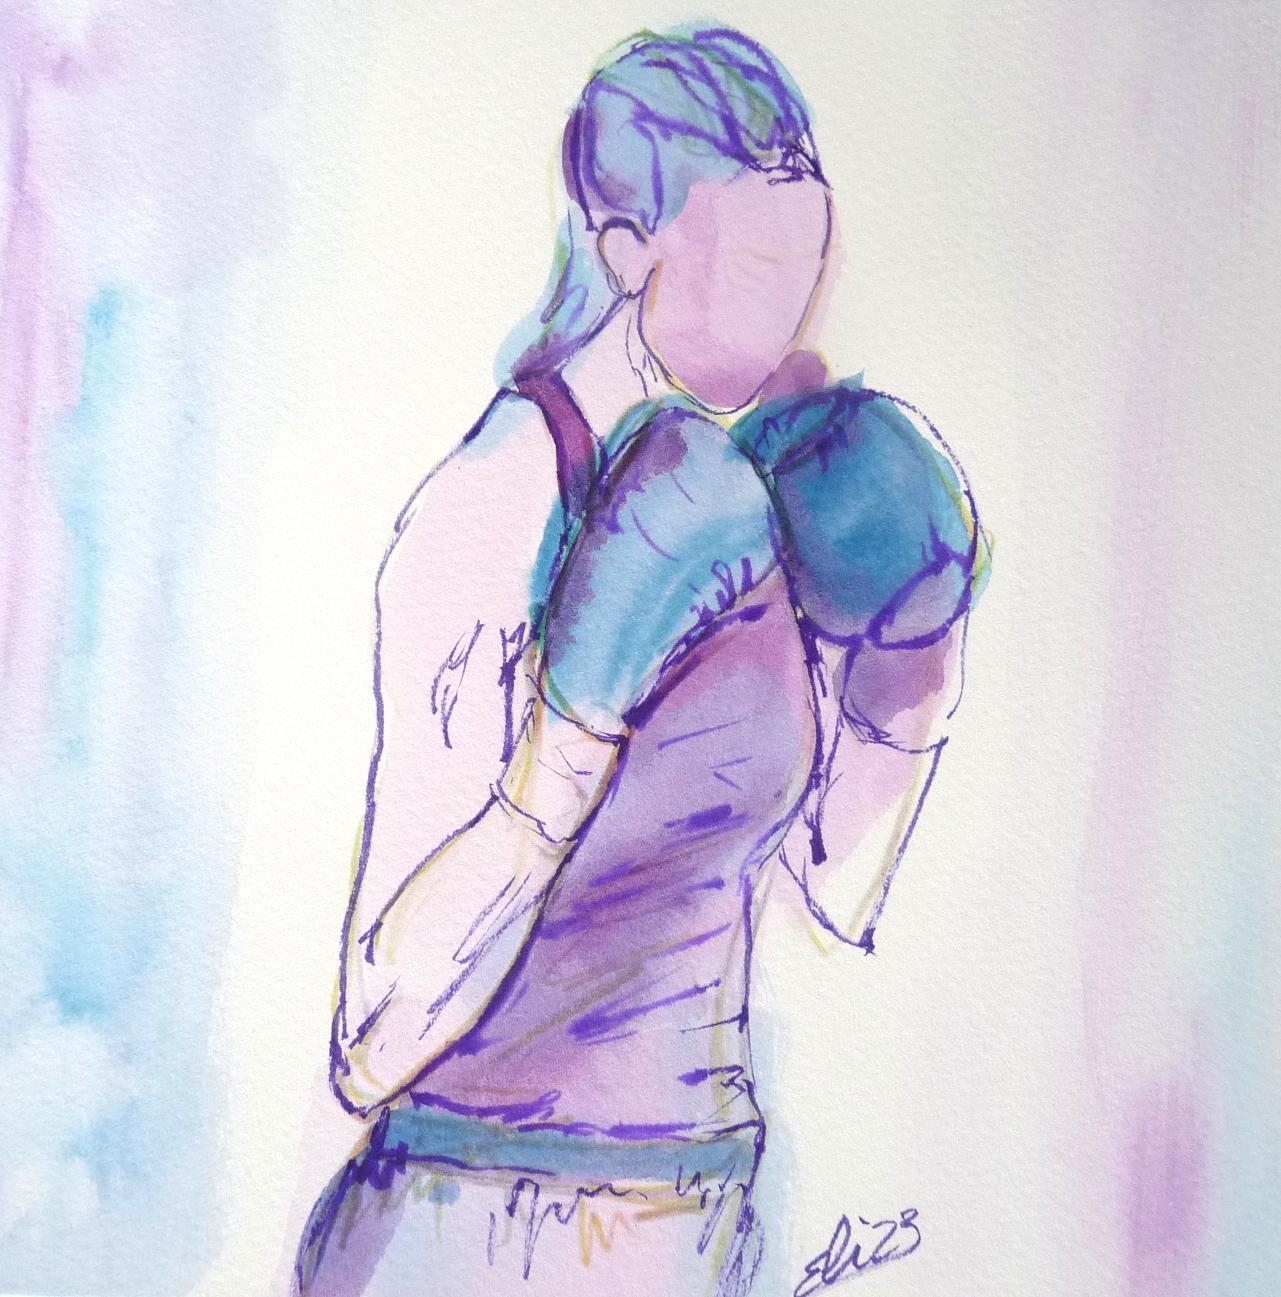 boxeuse sportive gant boxe sport feminin croquis violet dessin art